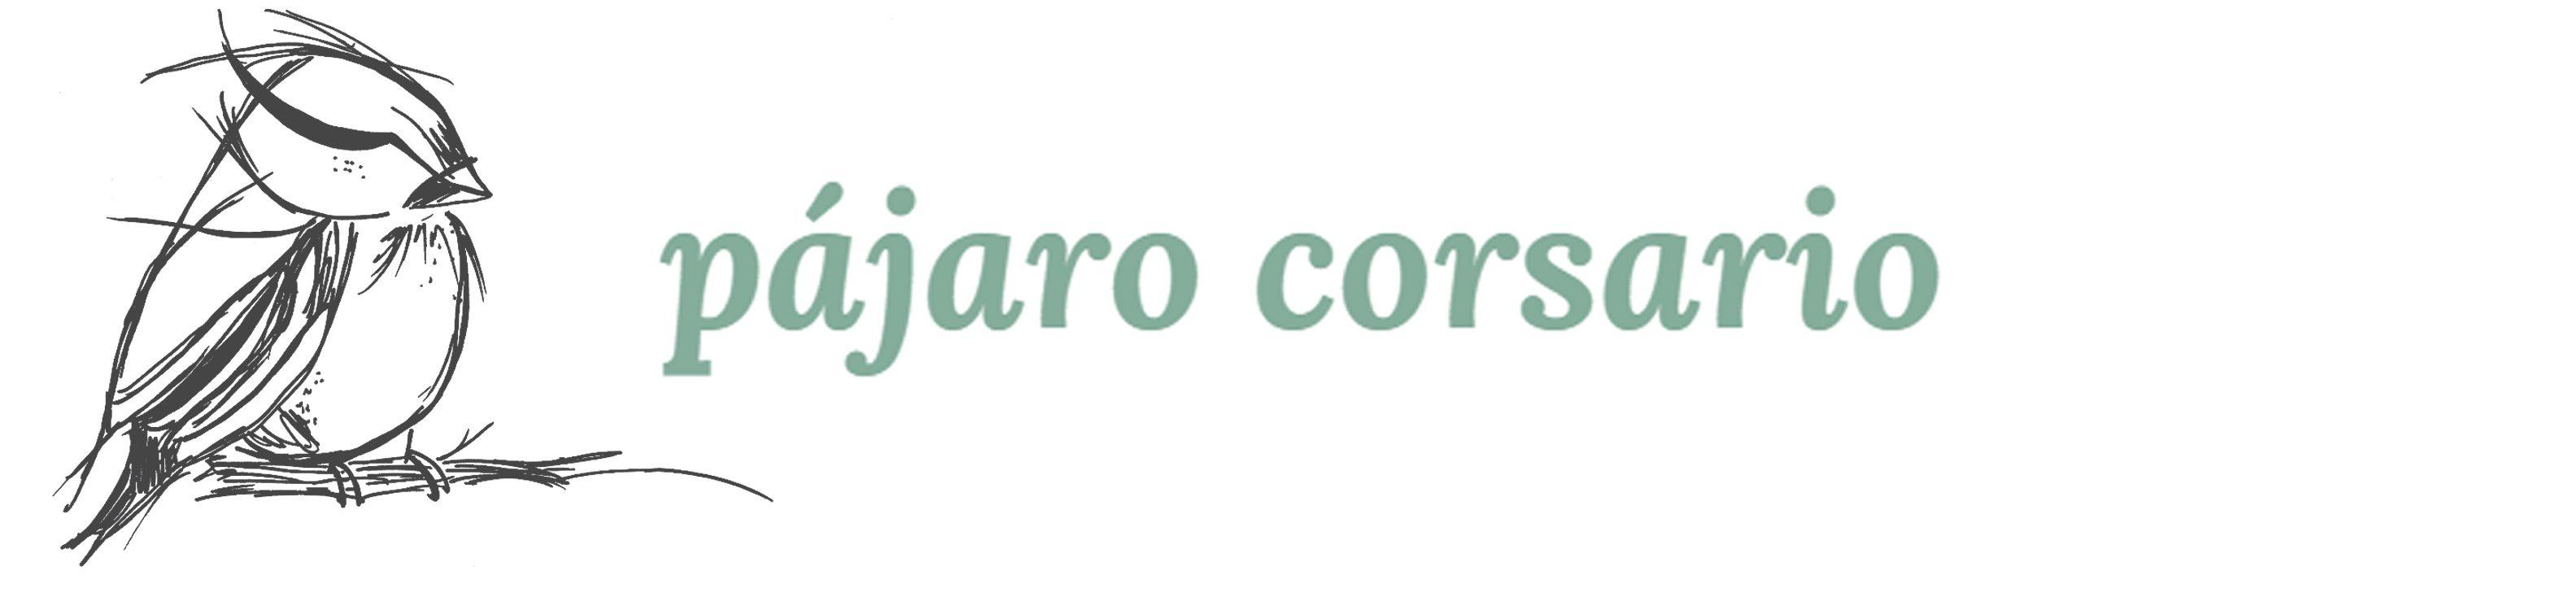 Pájaro corsario